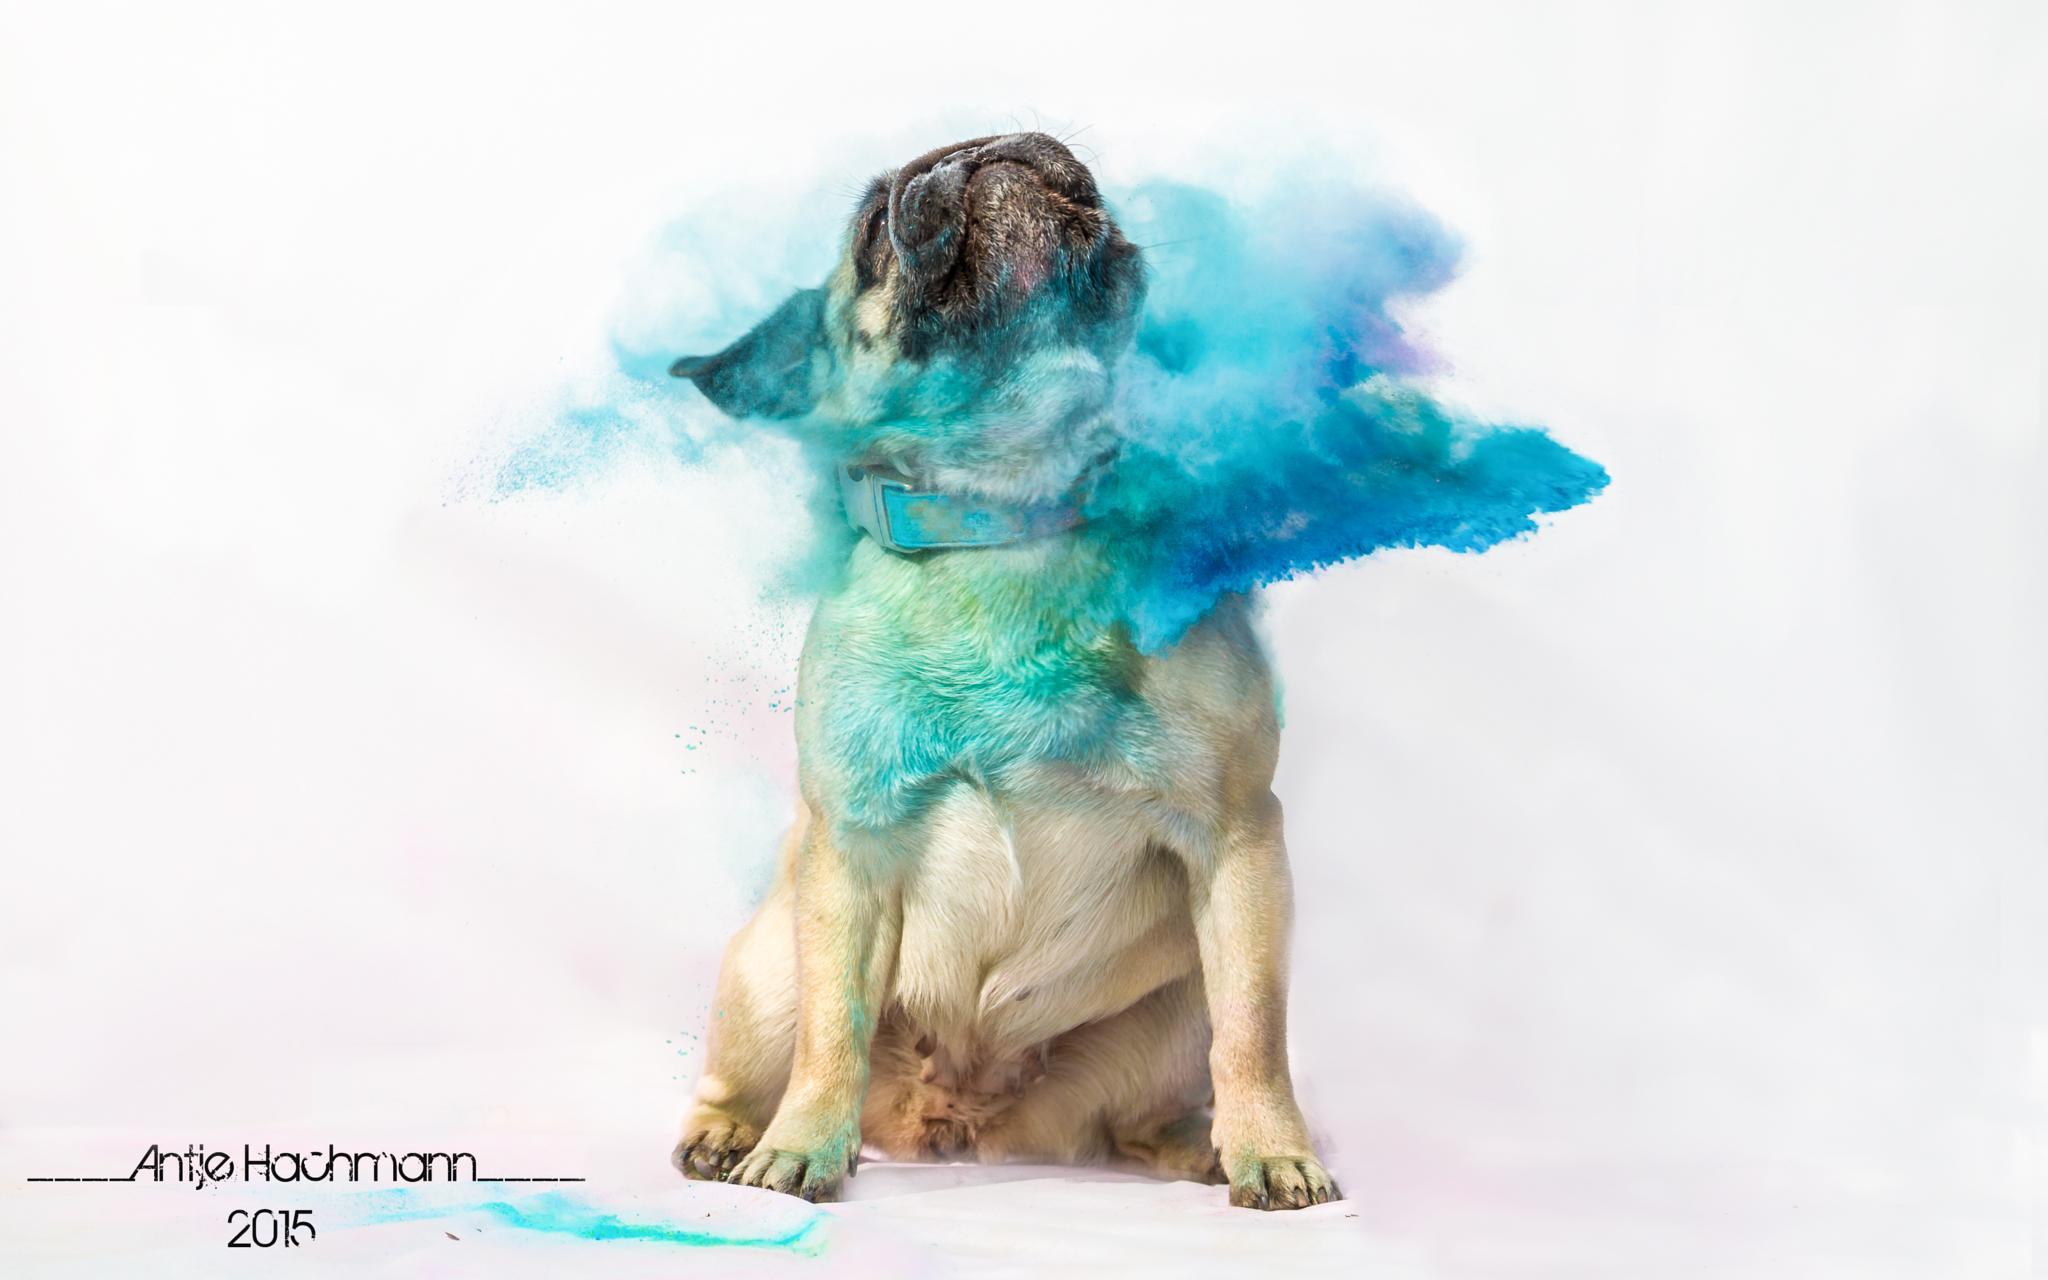 Holi Dogs - Mops by Antje Hachmann